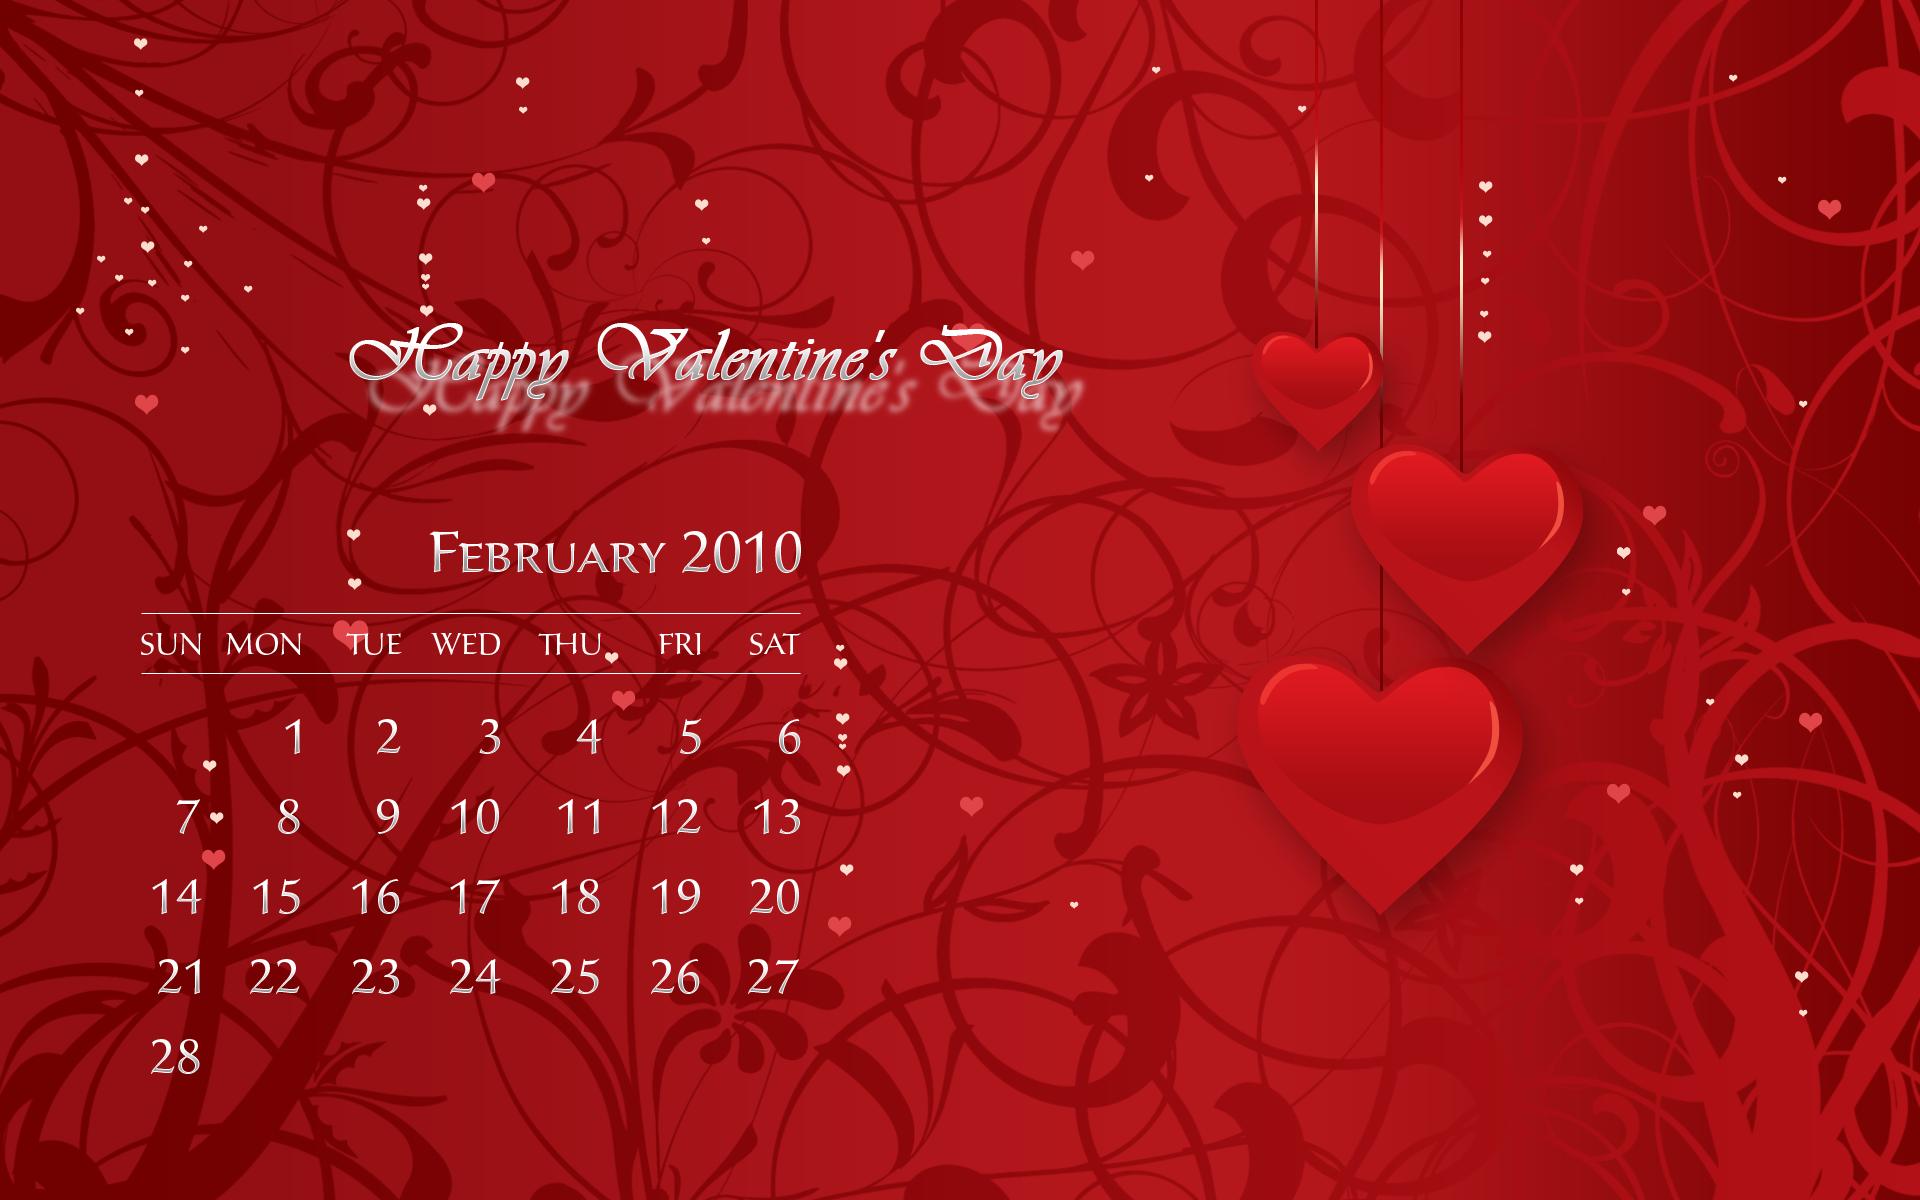 Valentine Wallpapers For Desktop 86 1920x1200